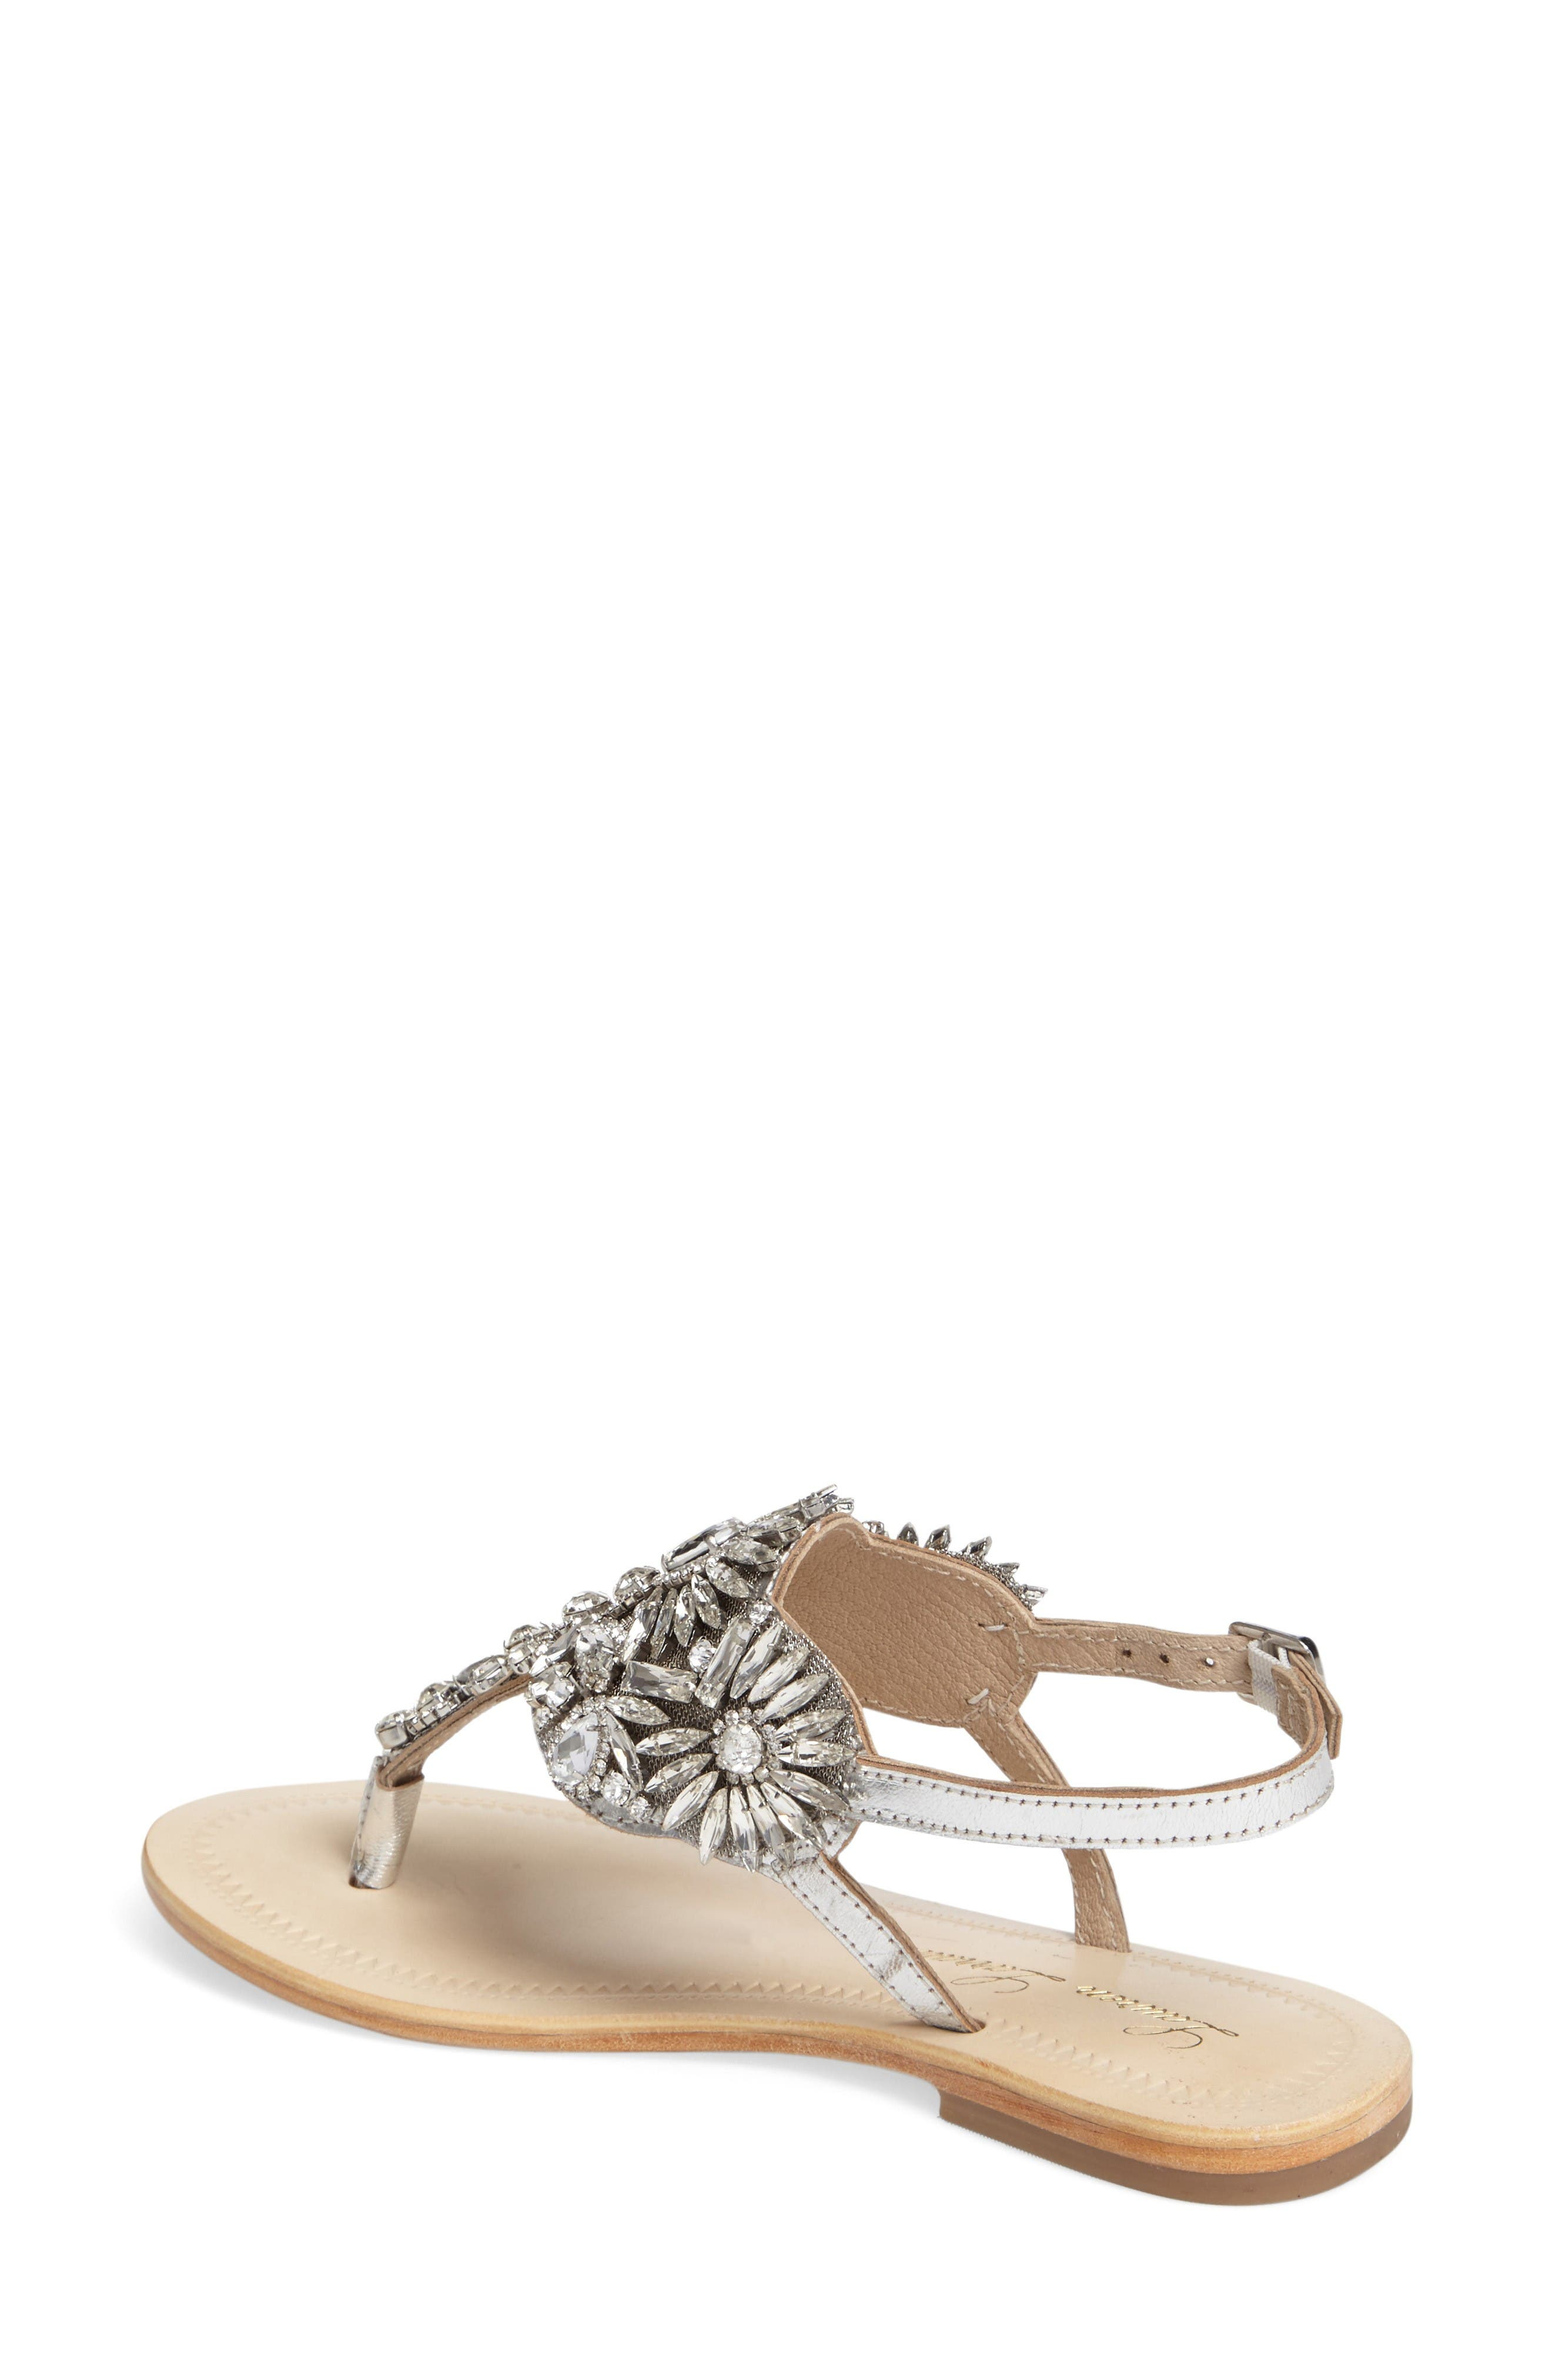 Alternate Image 2  - Lauren Lorraine Vera Embellished Sandal (Women)